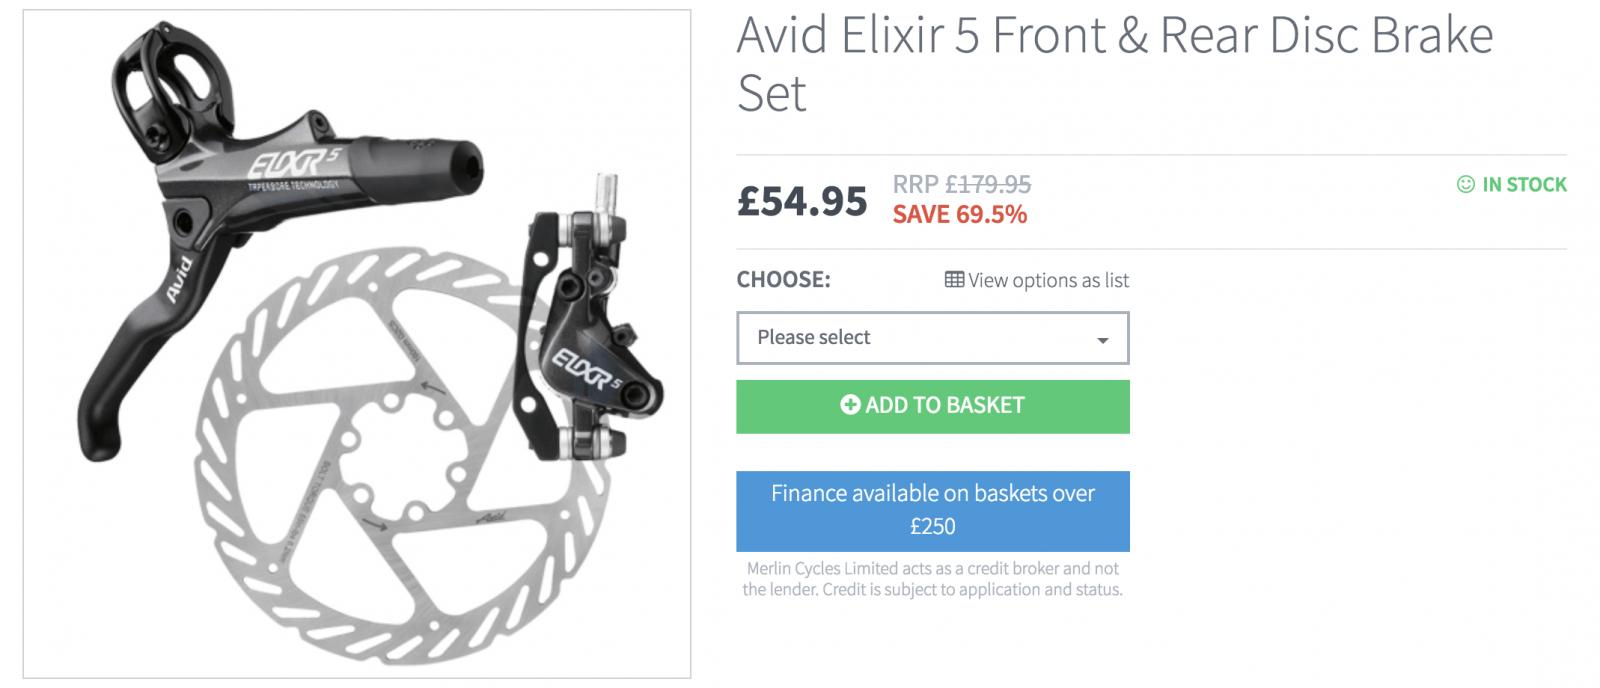 Avid Elixr Front and Rear Disc Brake Set - £54.99